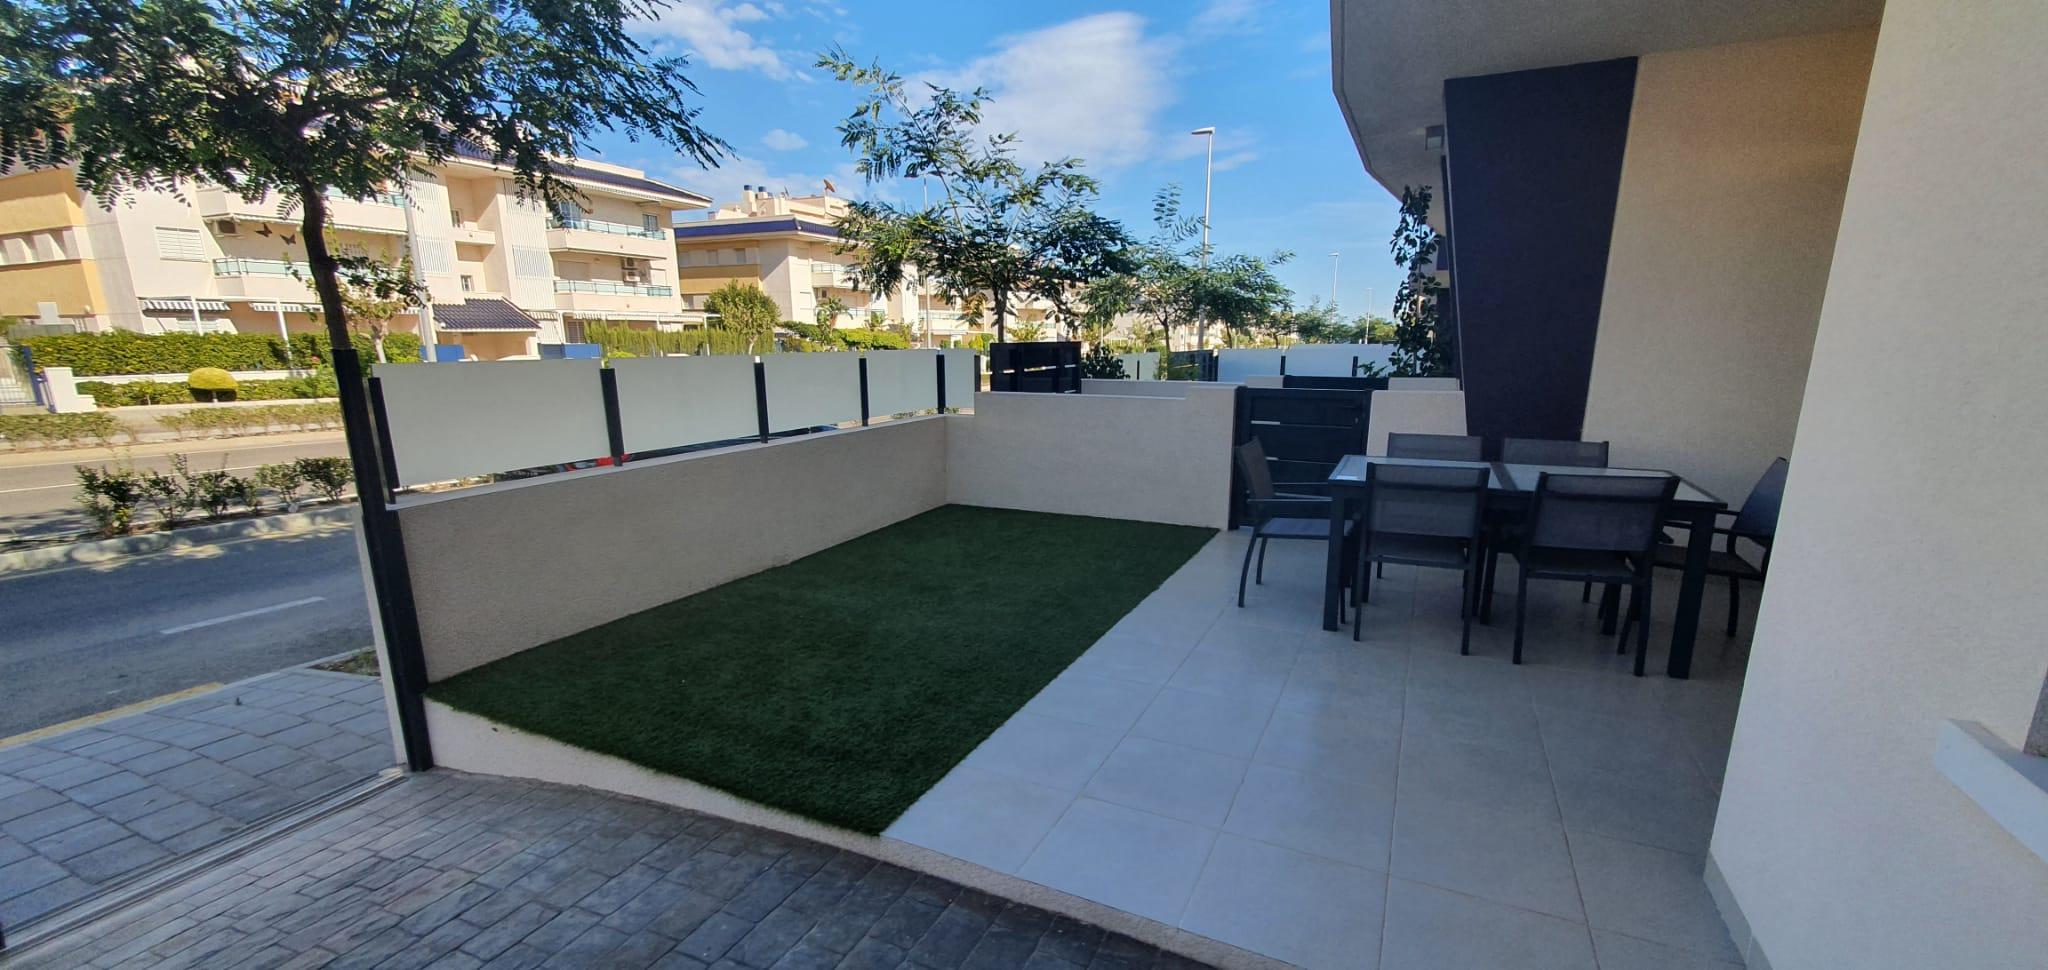 kf943677: Apartment for sale in Torre de la Horadada